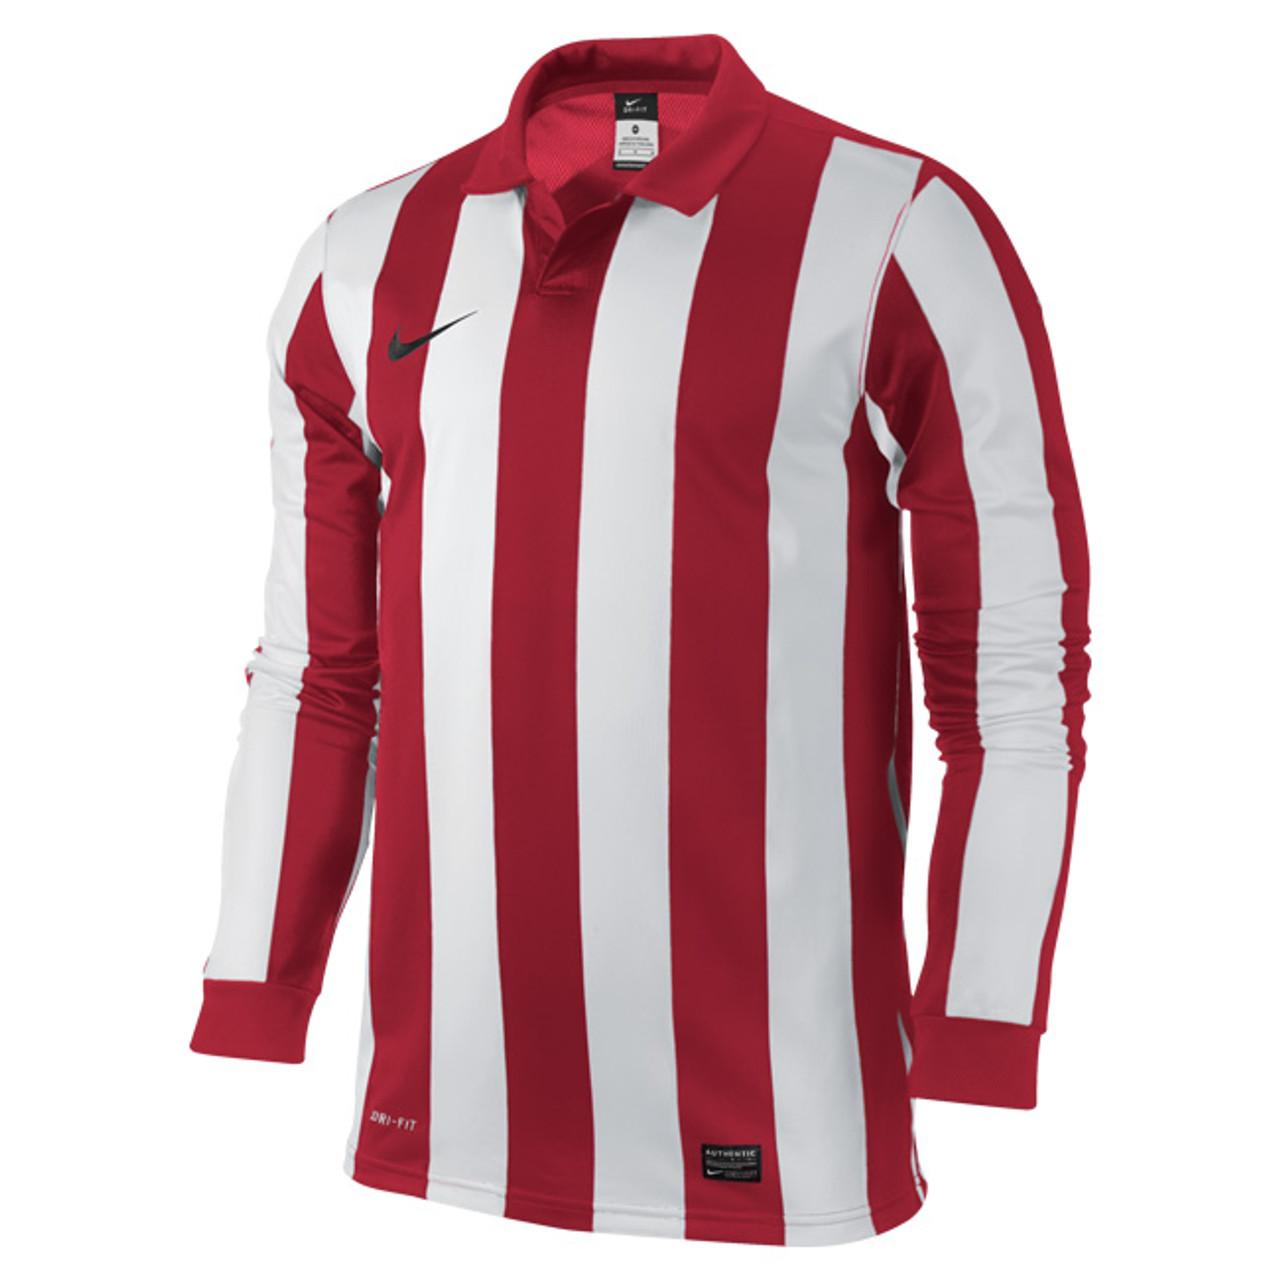 a81b1b68dcba Nike Inter Stripe III Game Jersey KIDS - Varsity Red White - BigWight